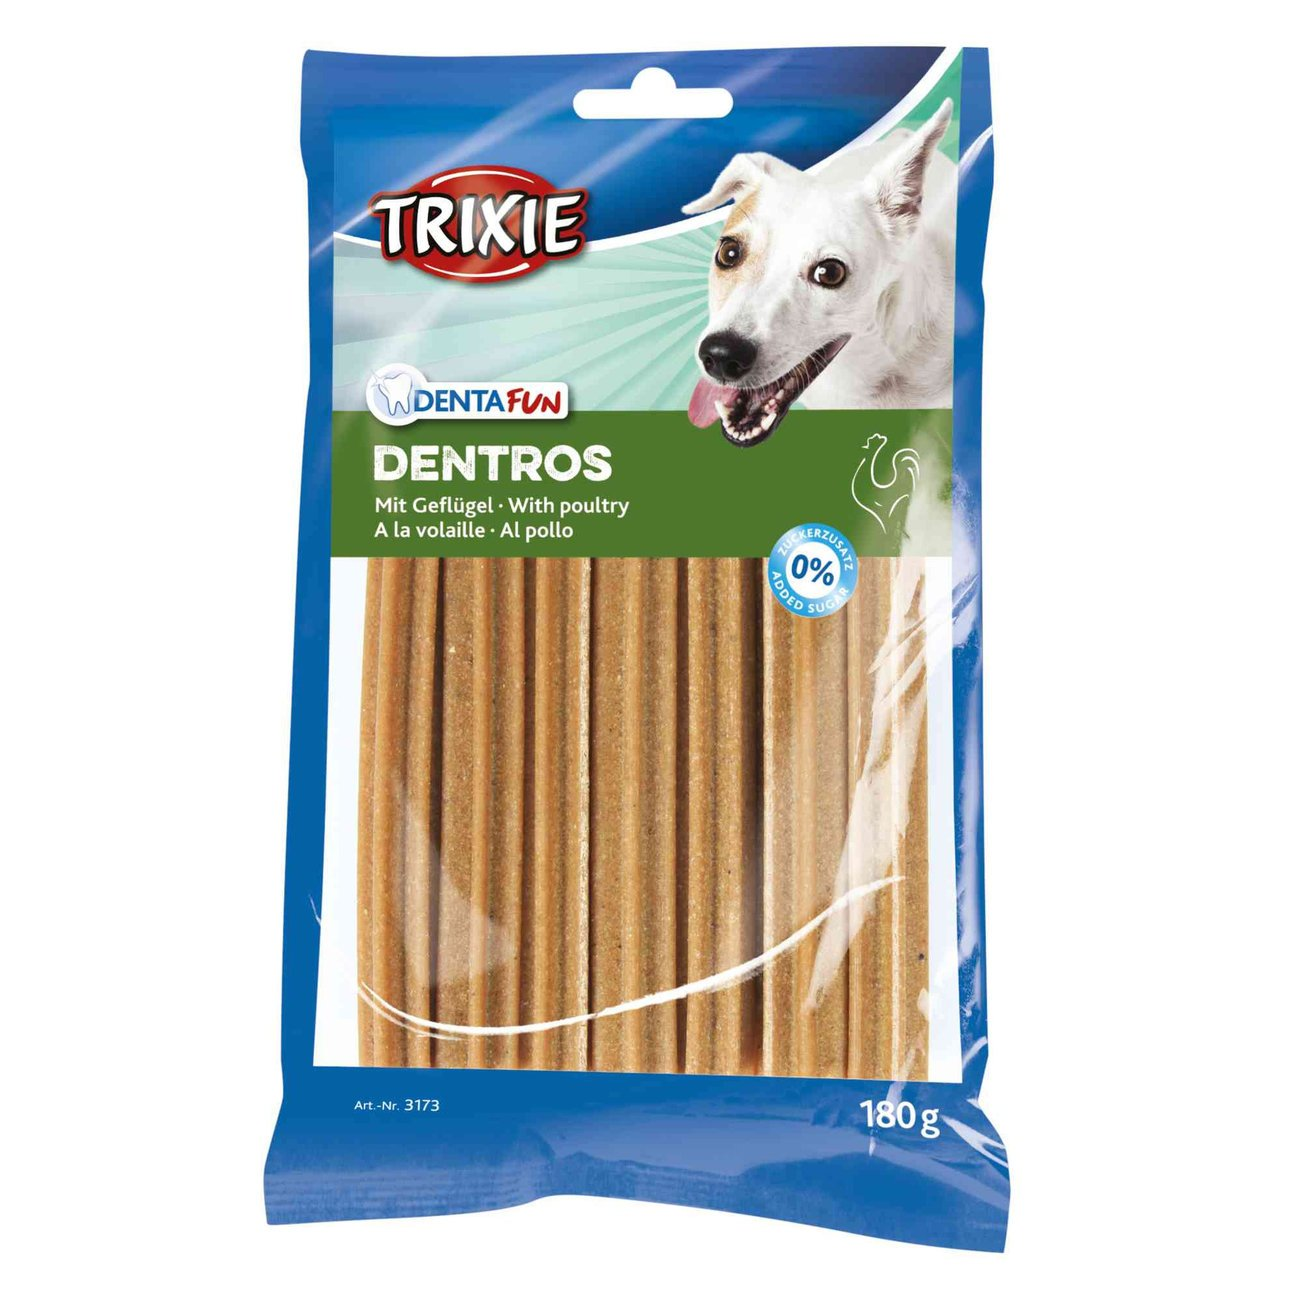 TRIXIE Denta Fun Dentros Zahnpflege Hunde Kaustangen 3173